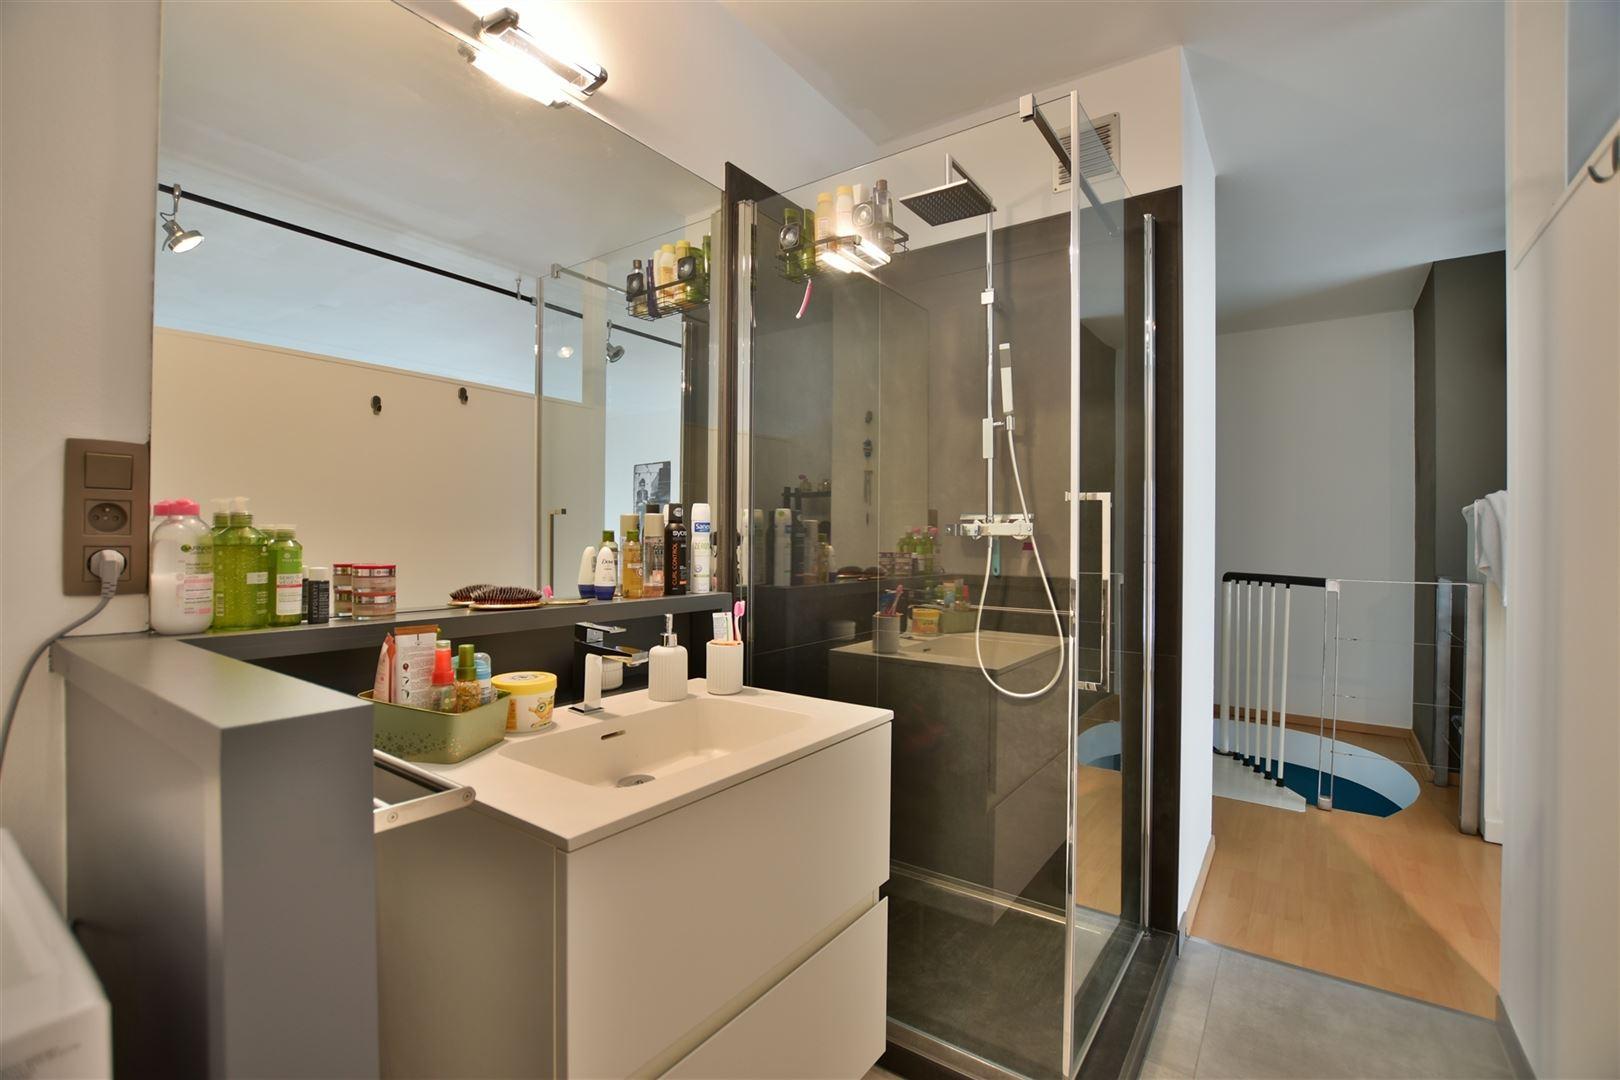 Foto 10 : Appartement te 9200 DENDERMONDE (België) - Prijs € 199.000